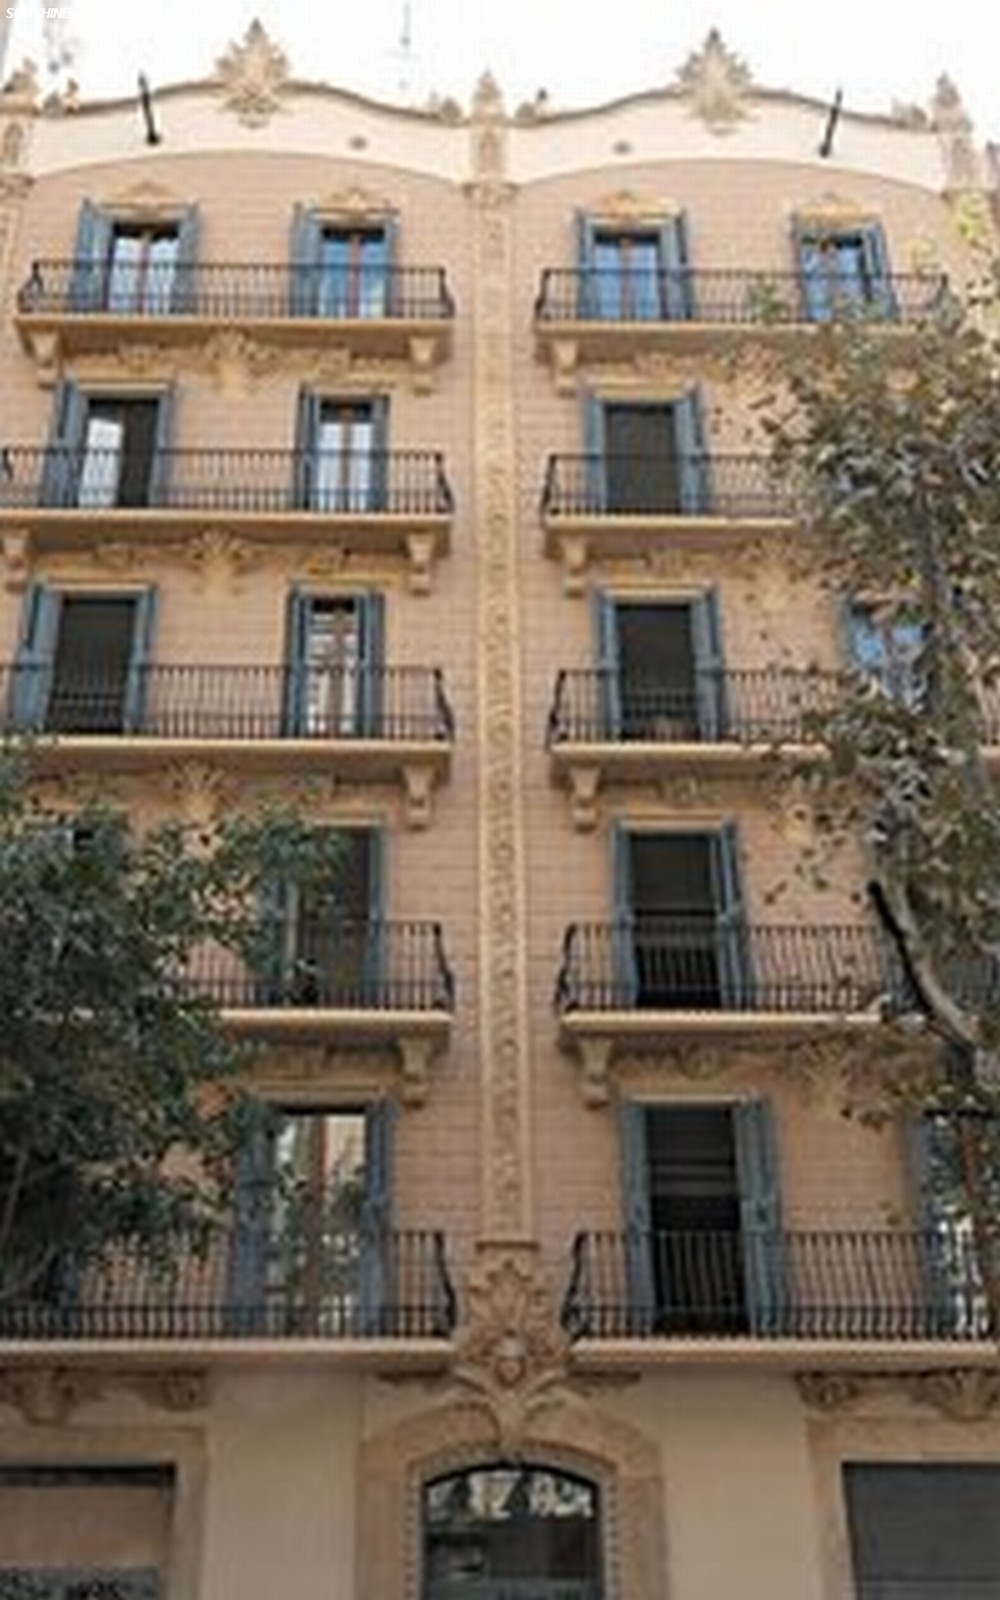 Hotel in spagna splendom suites a barcellona appartamenti for Appartamenti barcellona